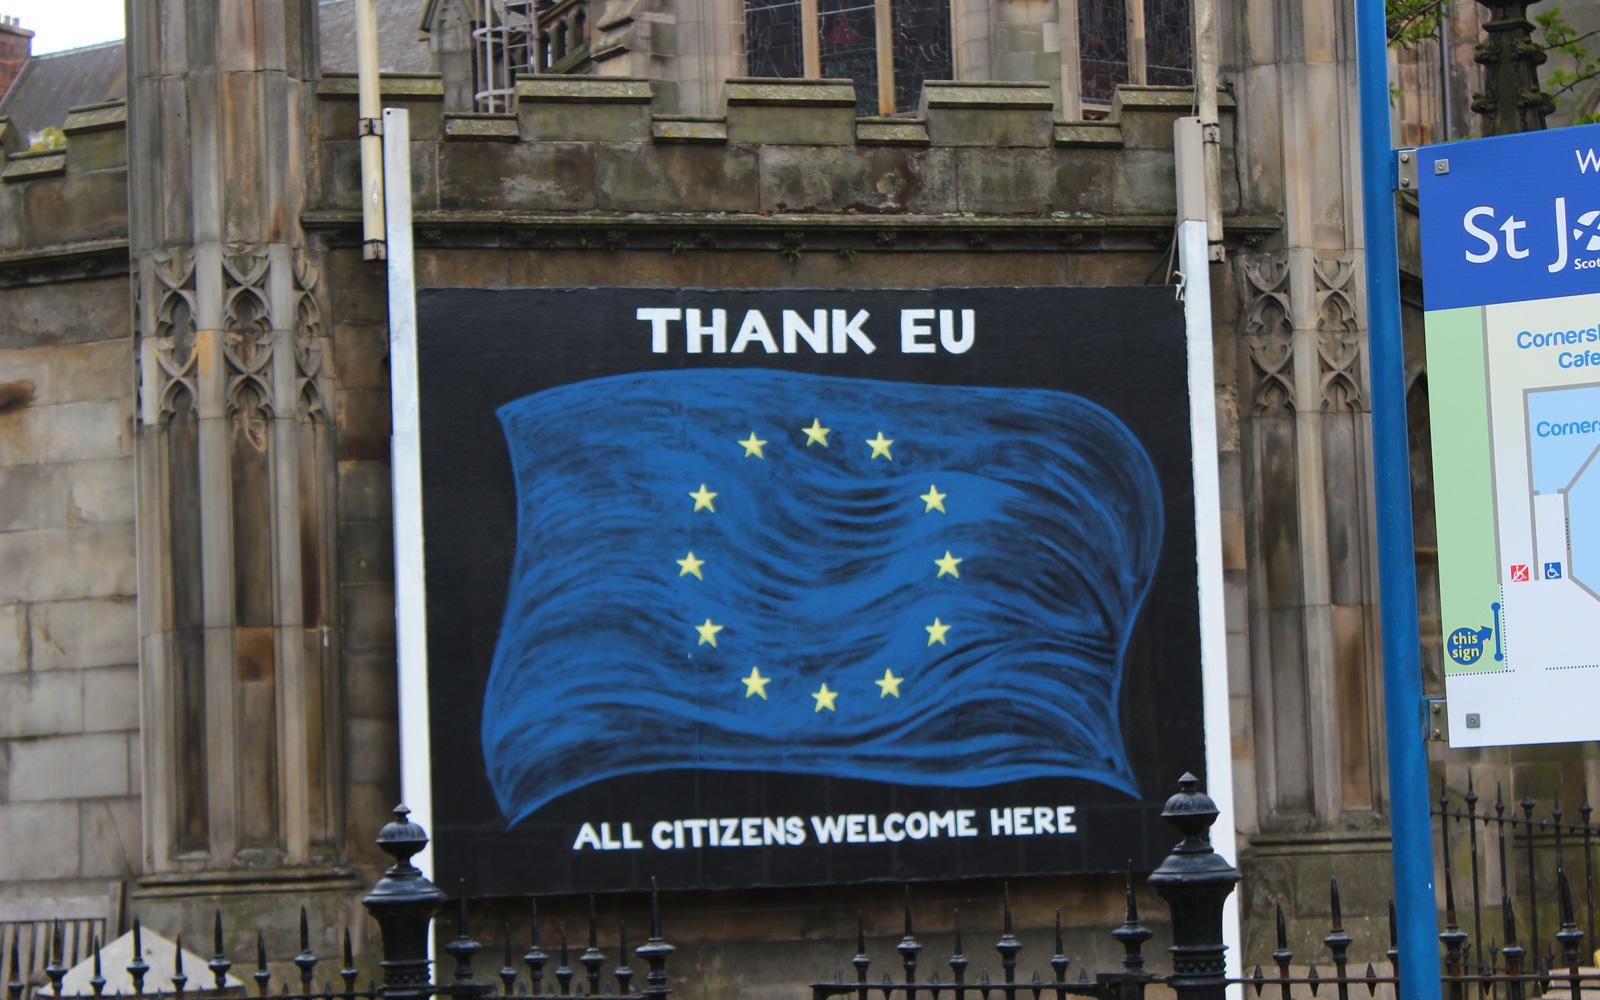 В Евросоюз без печати в паспорт